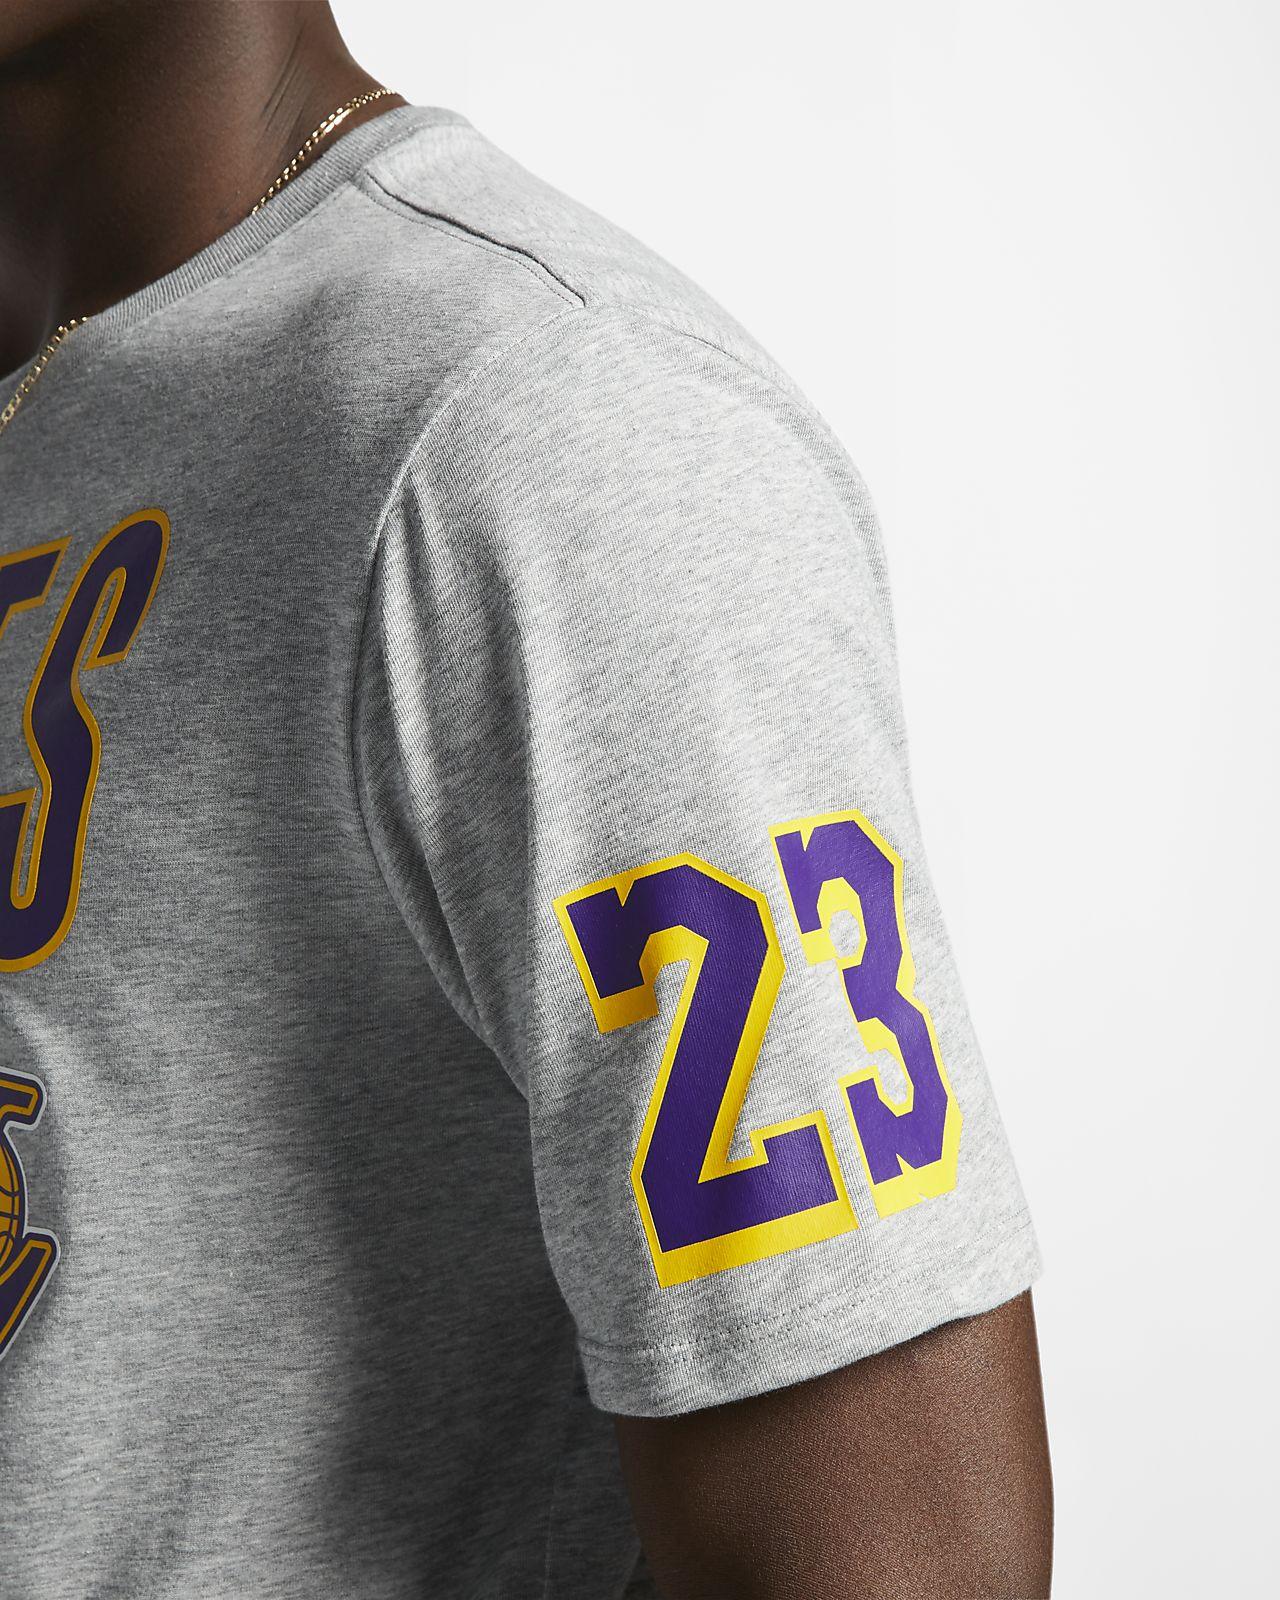 78cfbefd953 Los Angeles Lakers Nike Dri-FIT Men s NBA T-Shirt. Nike.com GB